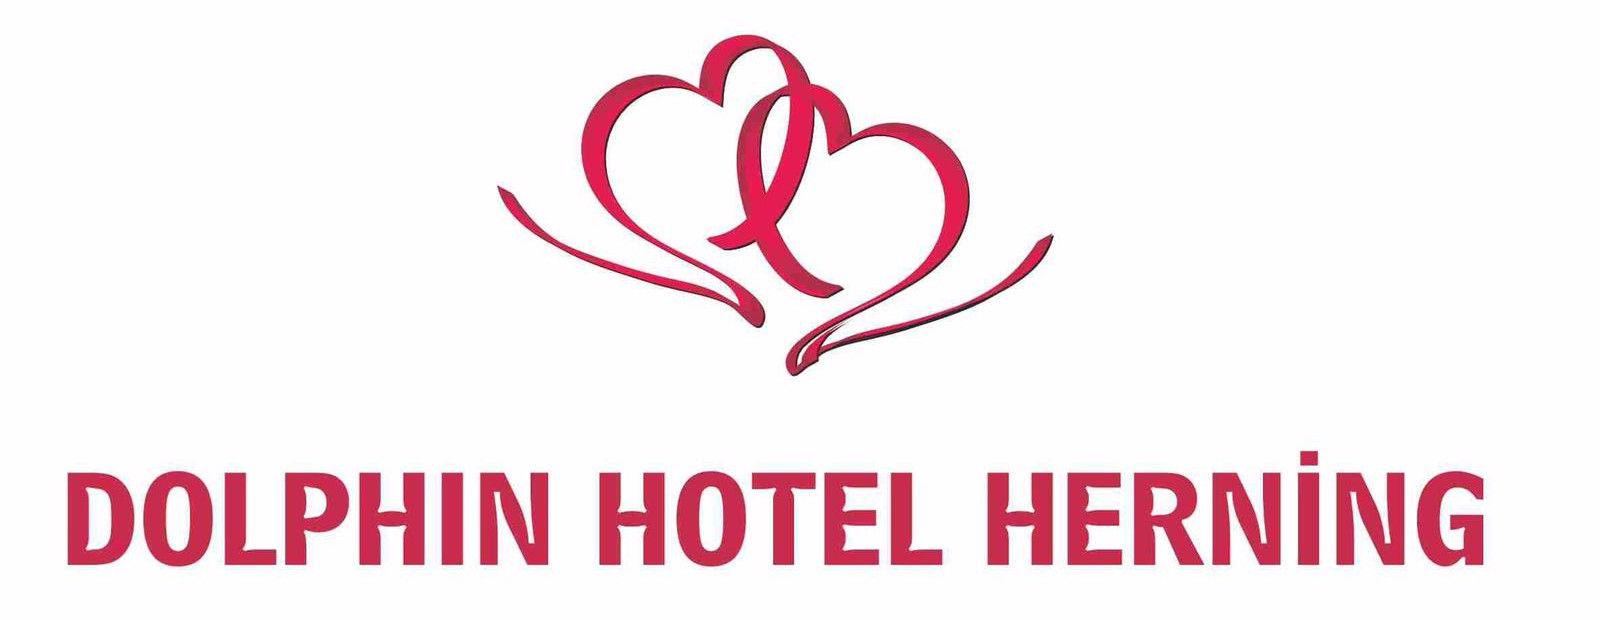 Dolphin Hotel Herning